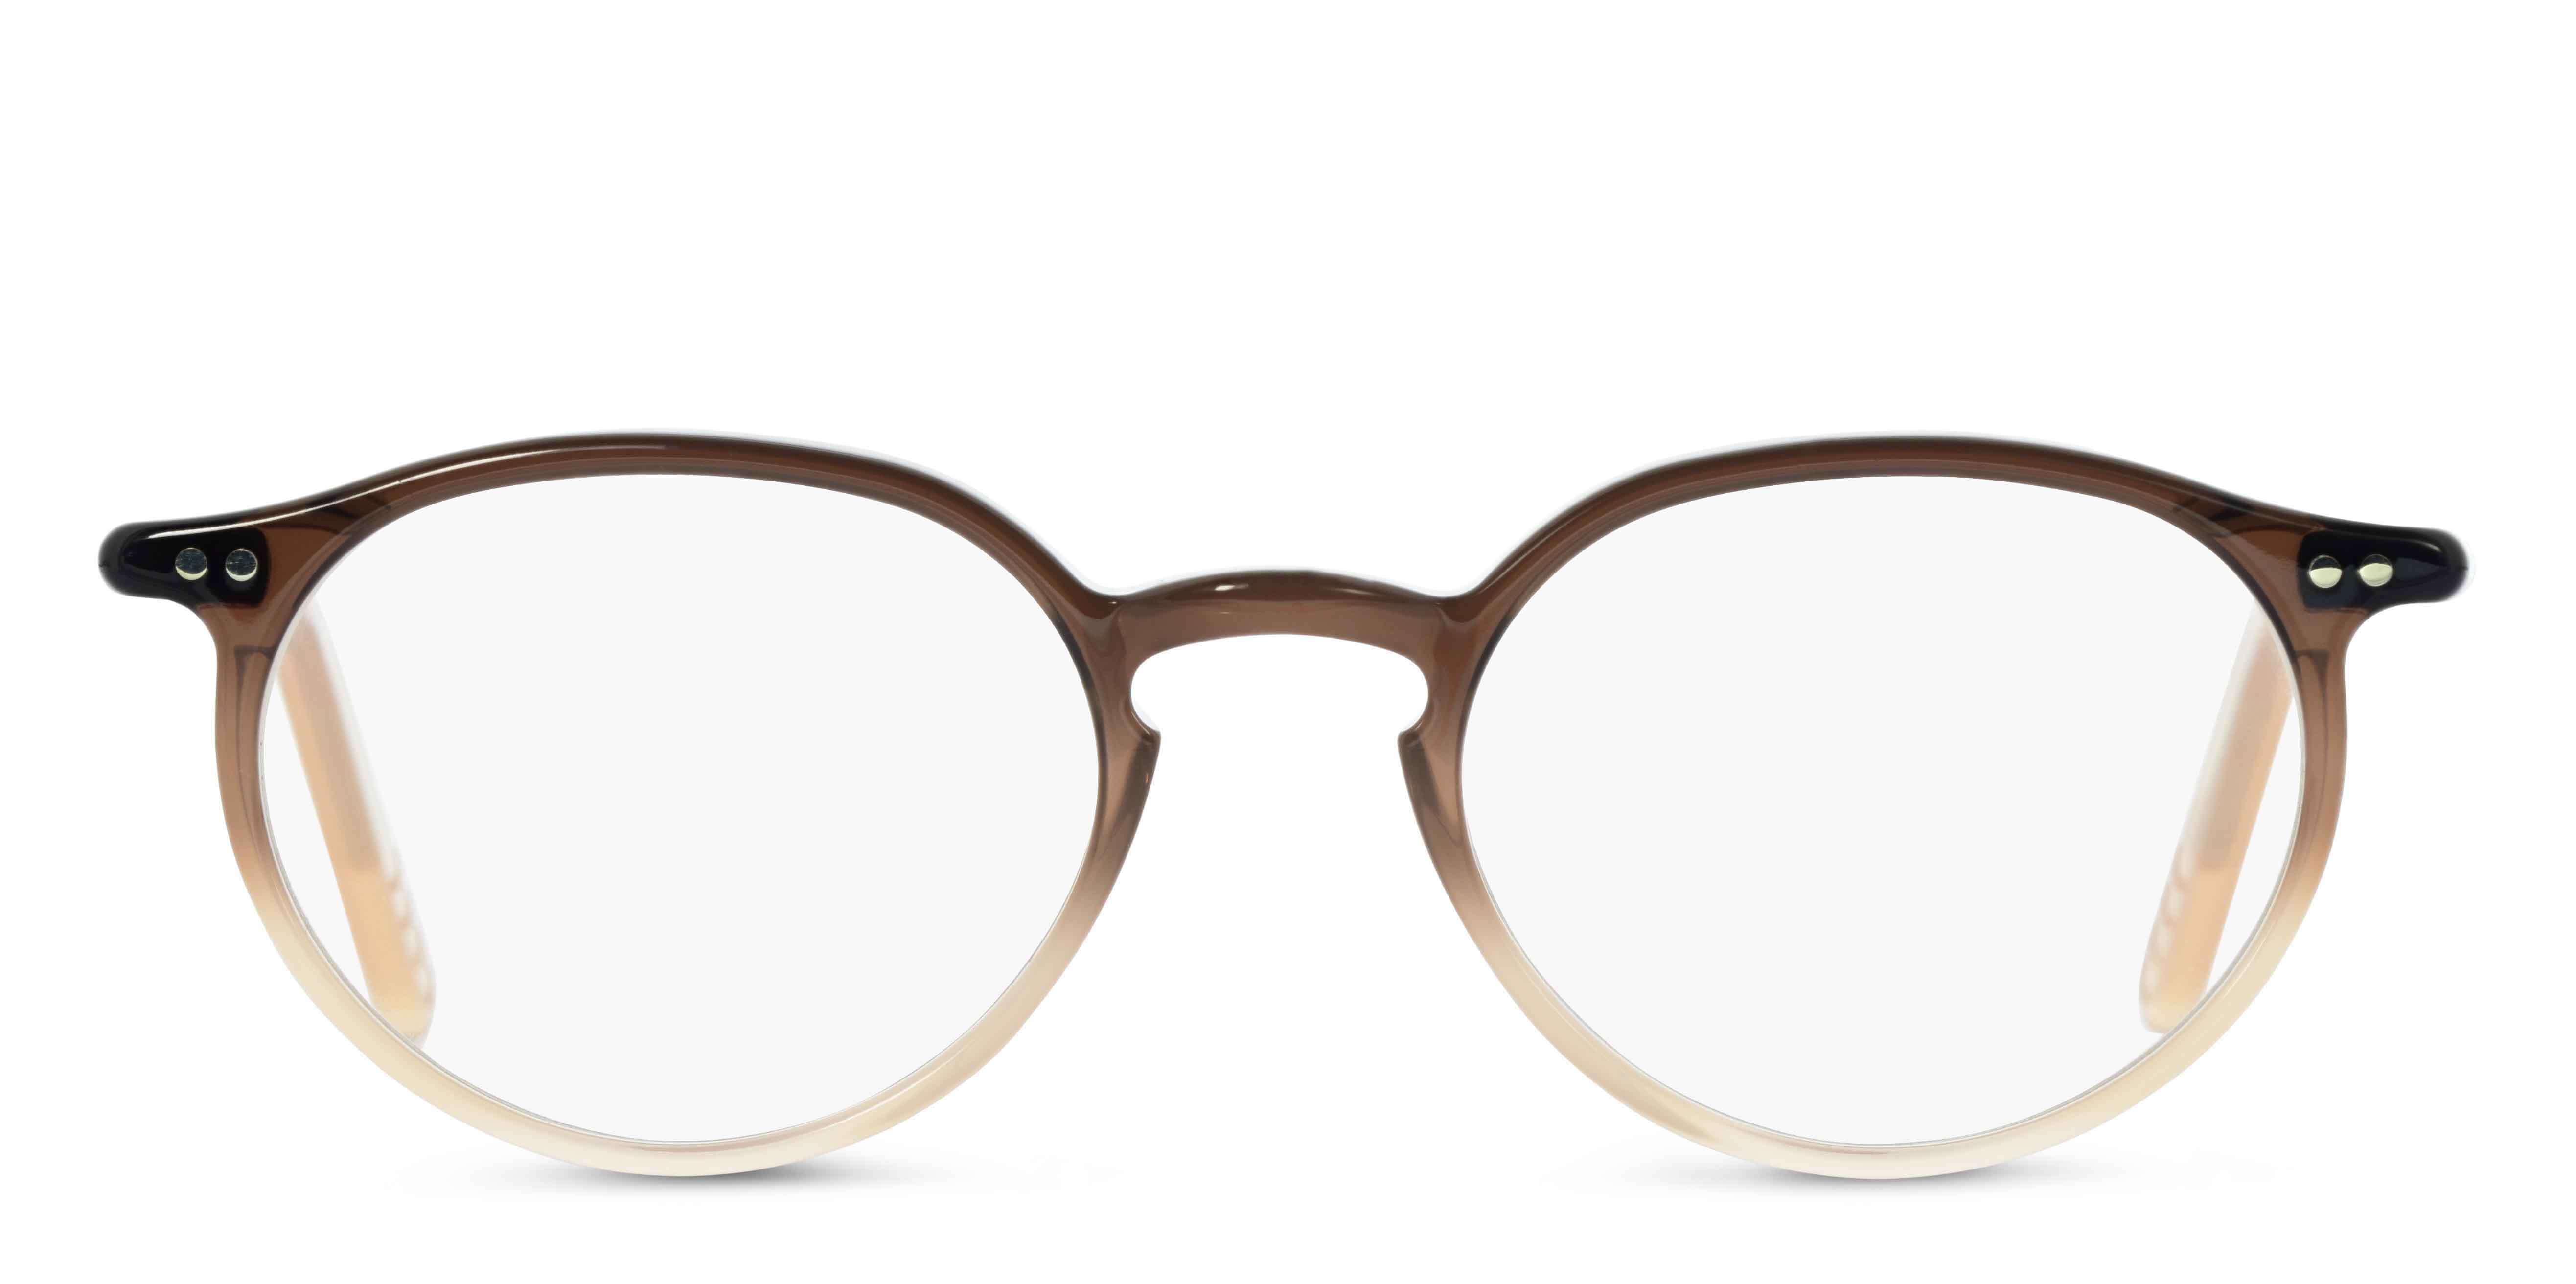 Lunor - Korrekturbrille: Modell: A5_226_21_01